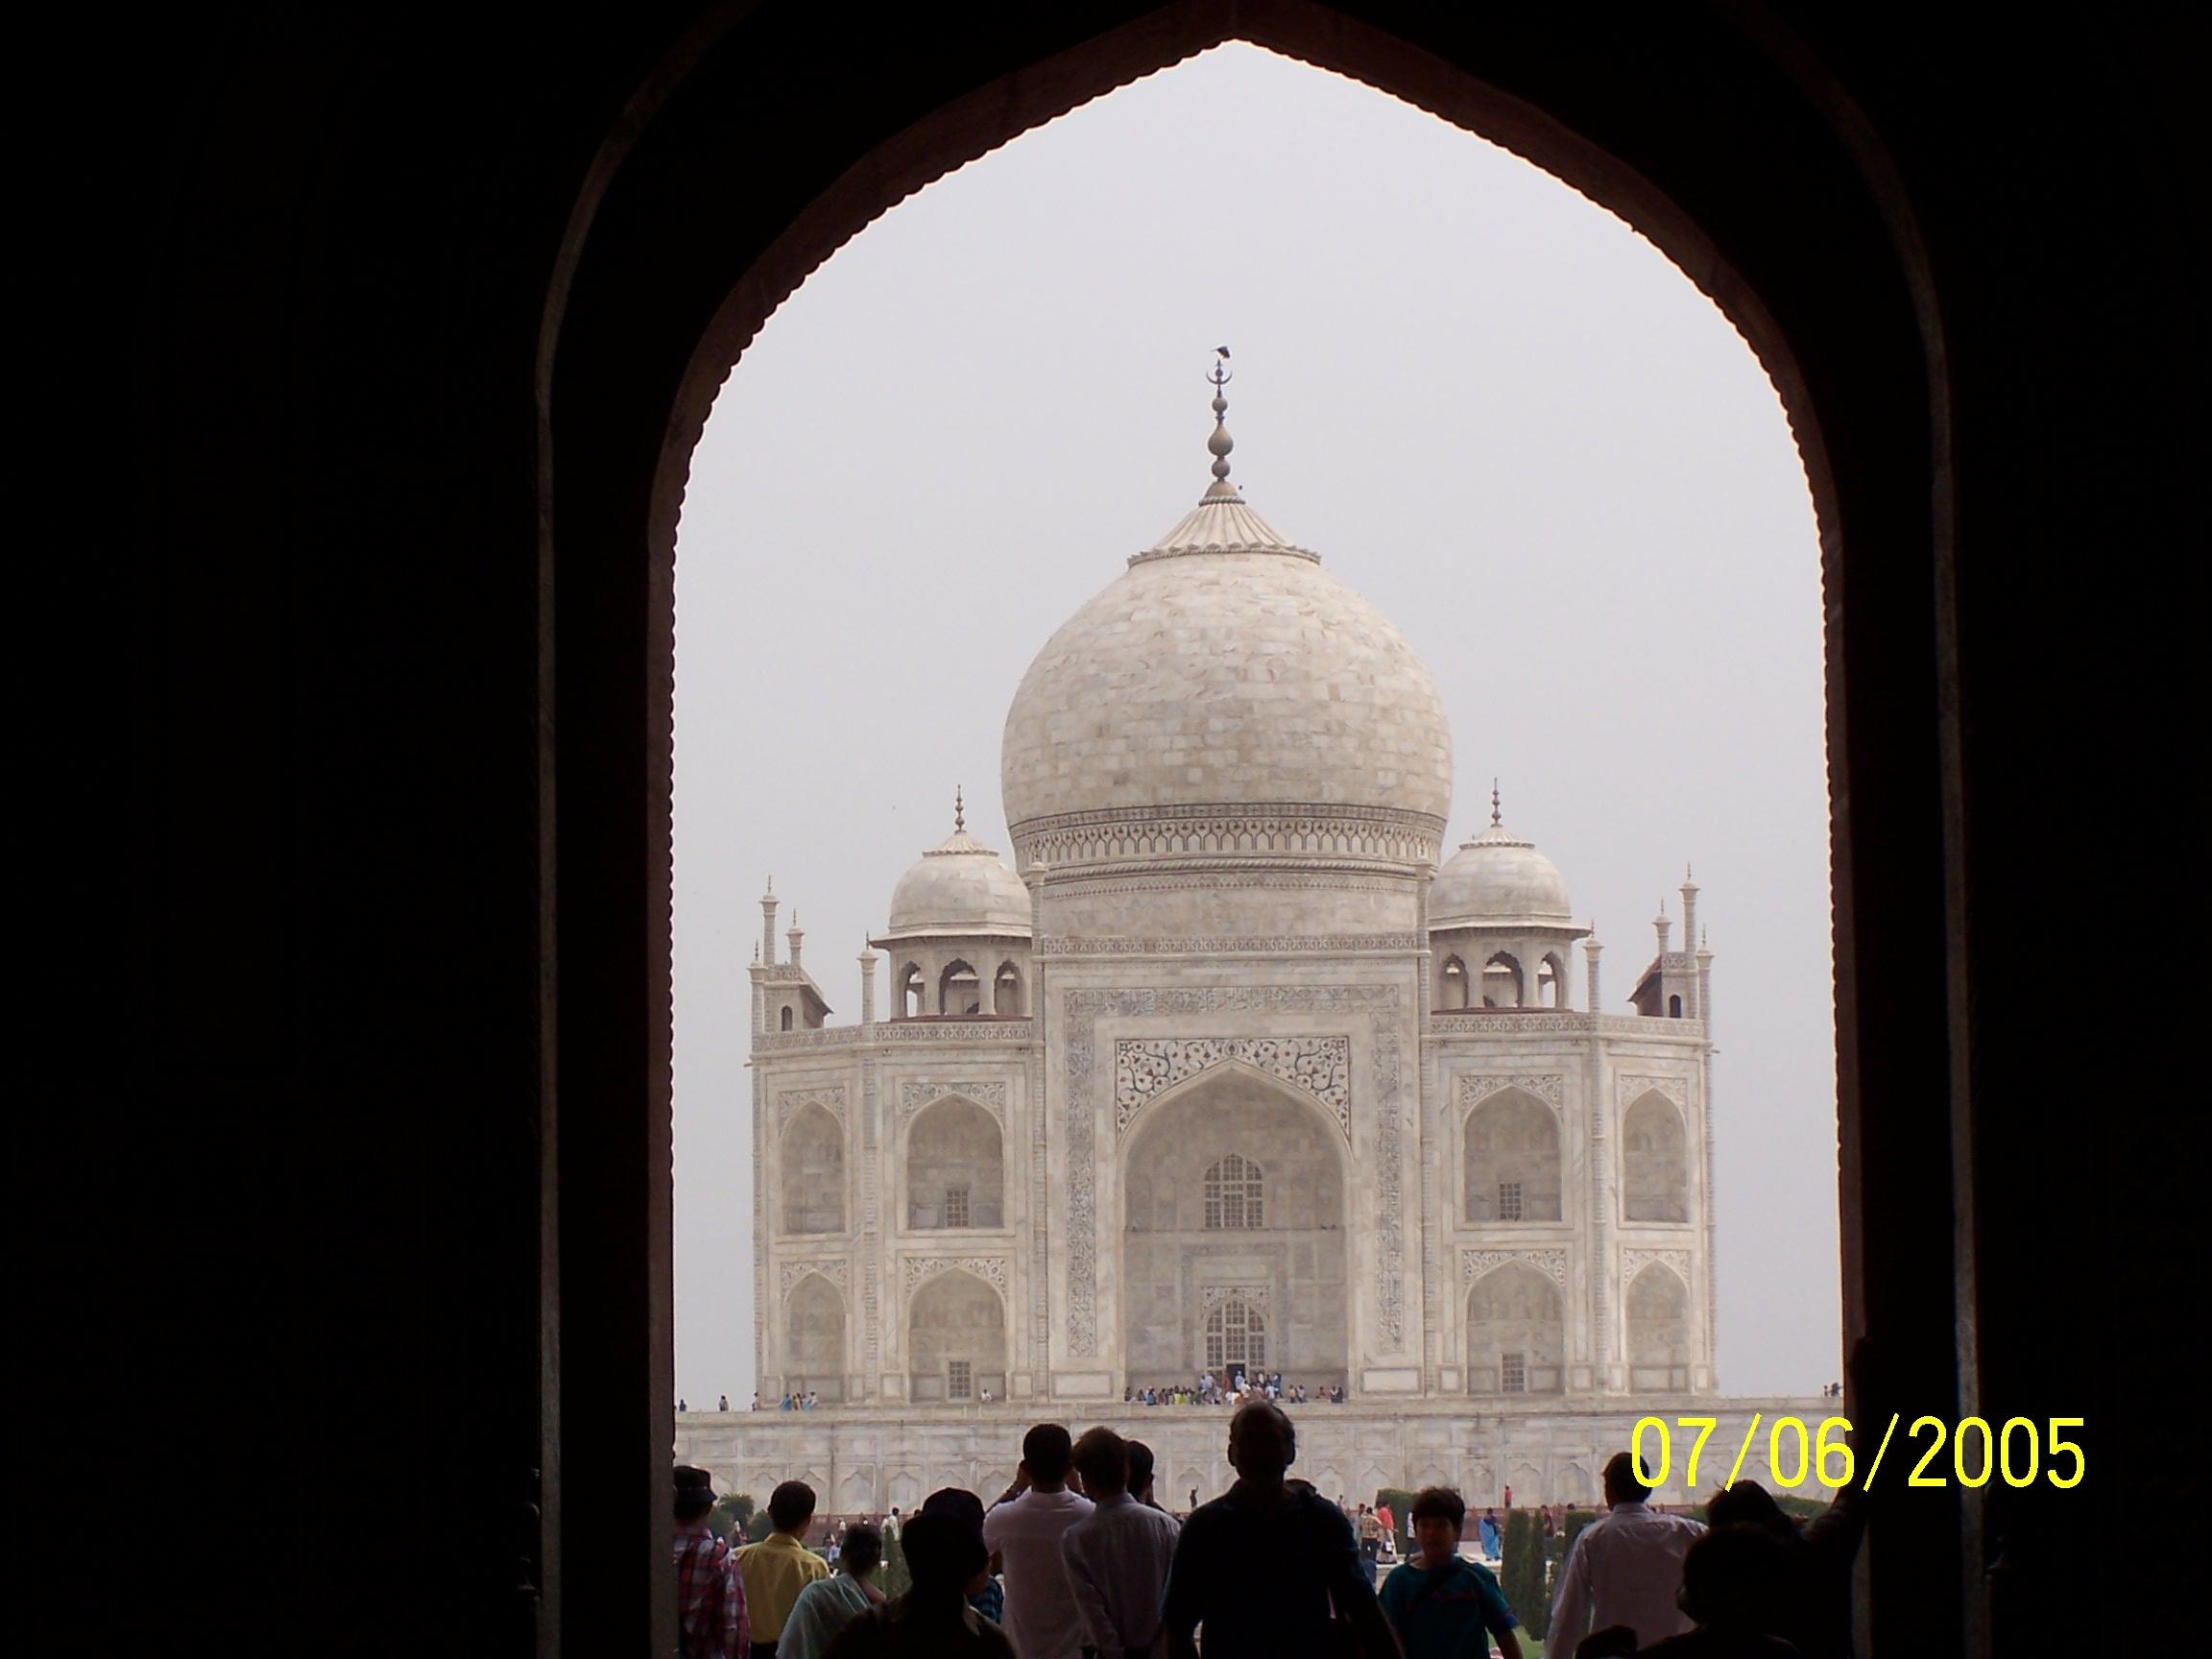 First view of the Taj